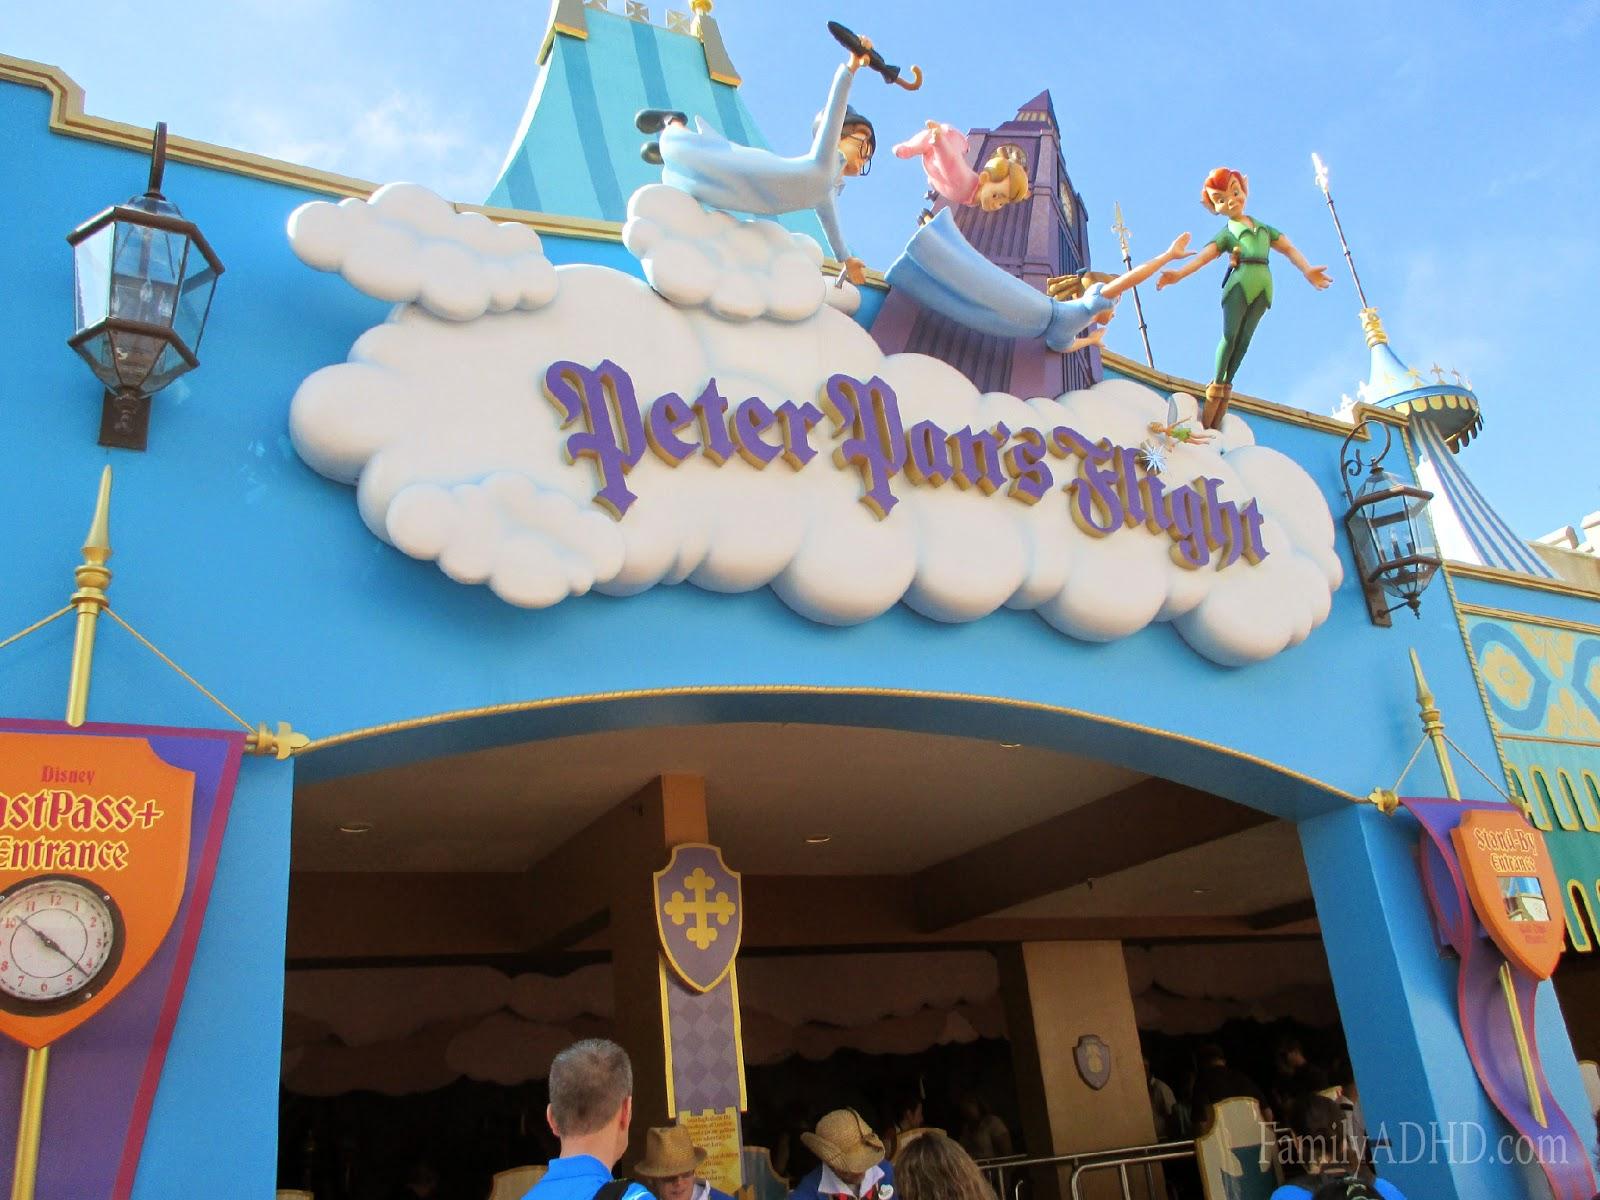 orlando family travel guide 2015 fantasyland peter pan's flight